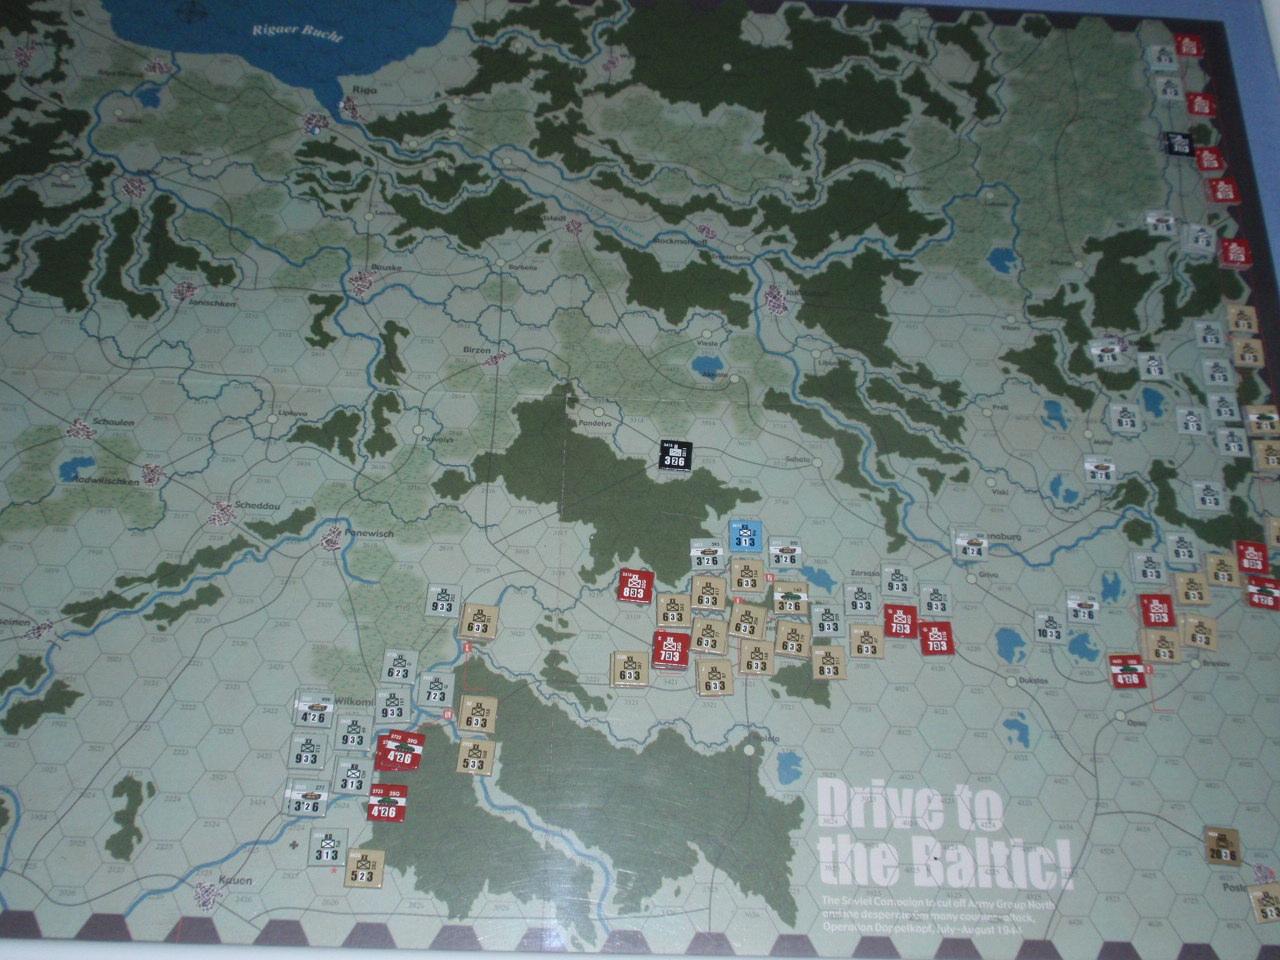 MIH/CMJ「Drive to the Baltic!」をソロプレイ①_b0162202_10304597.jpg